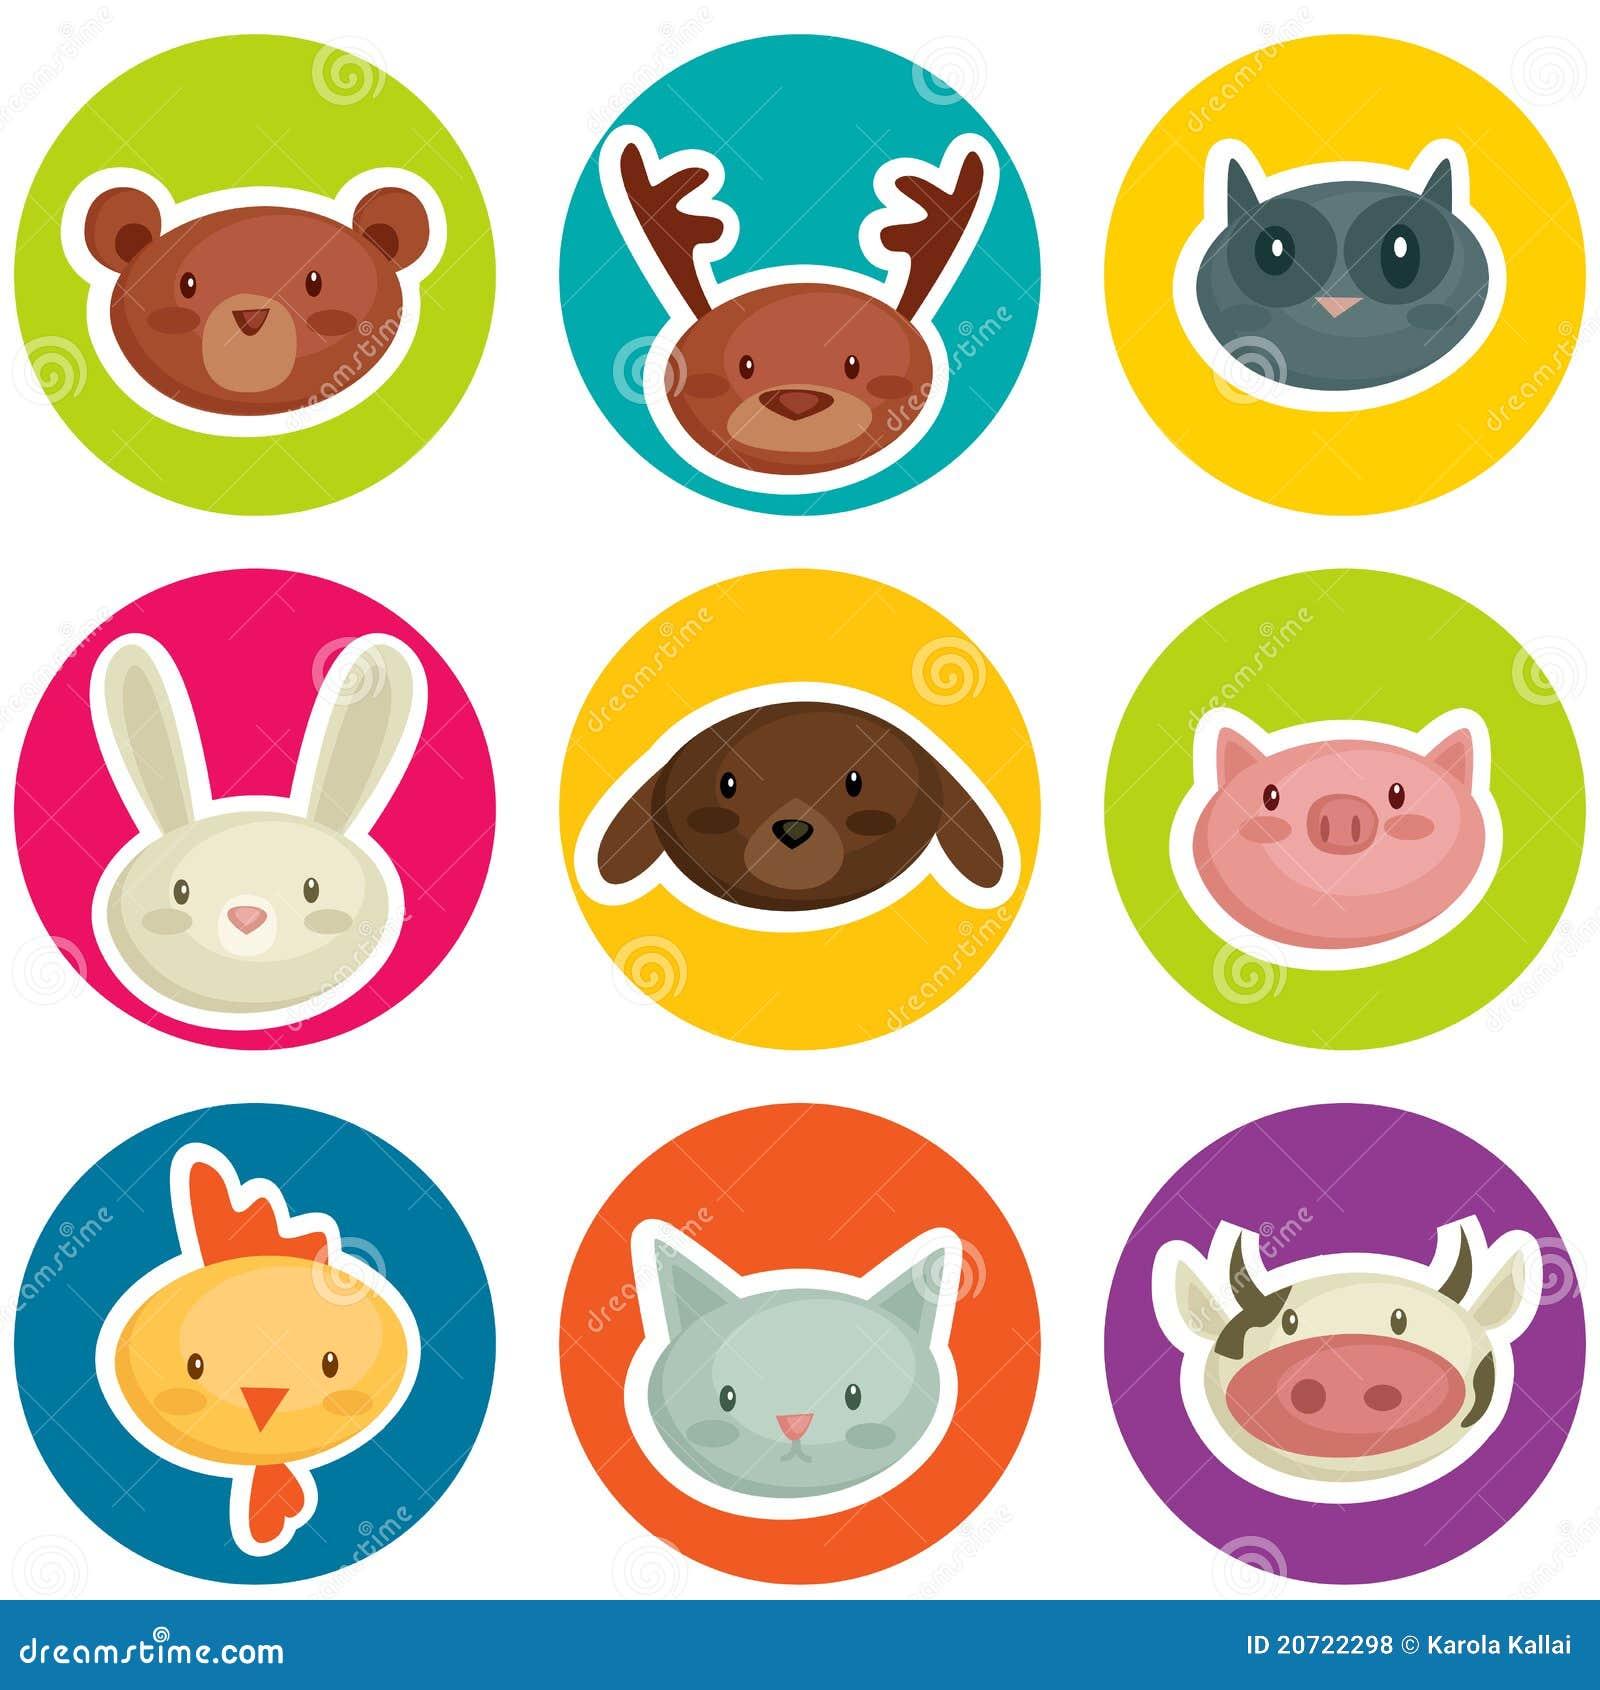 Cartoon Animal Head Stickers Royalty Free Stock Photos